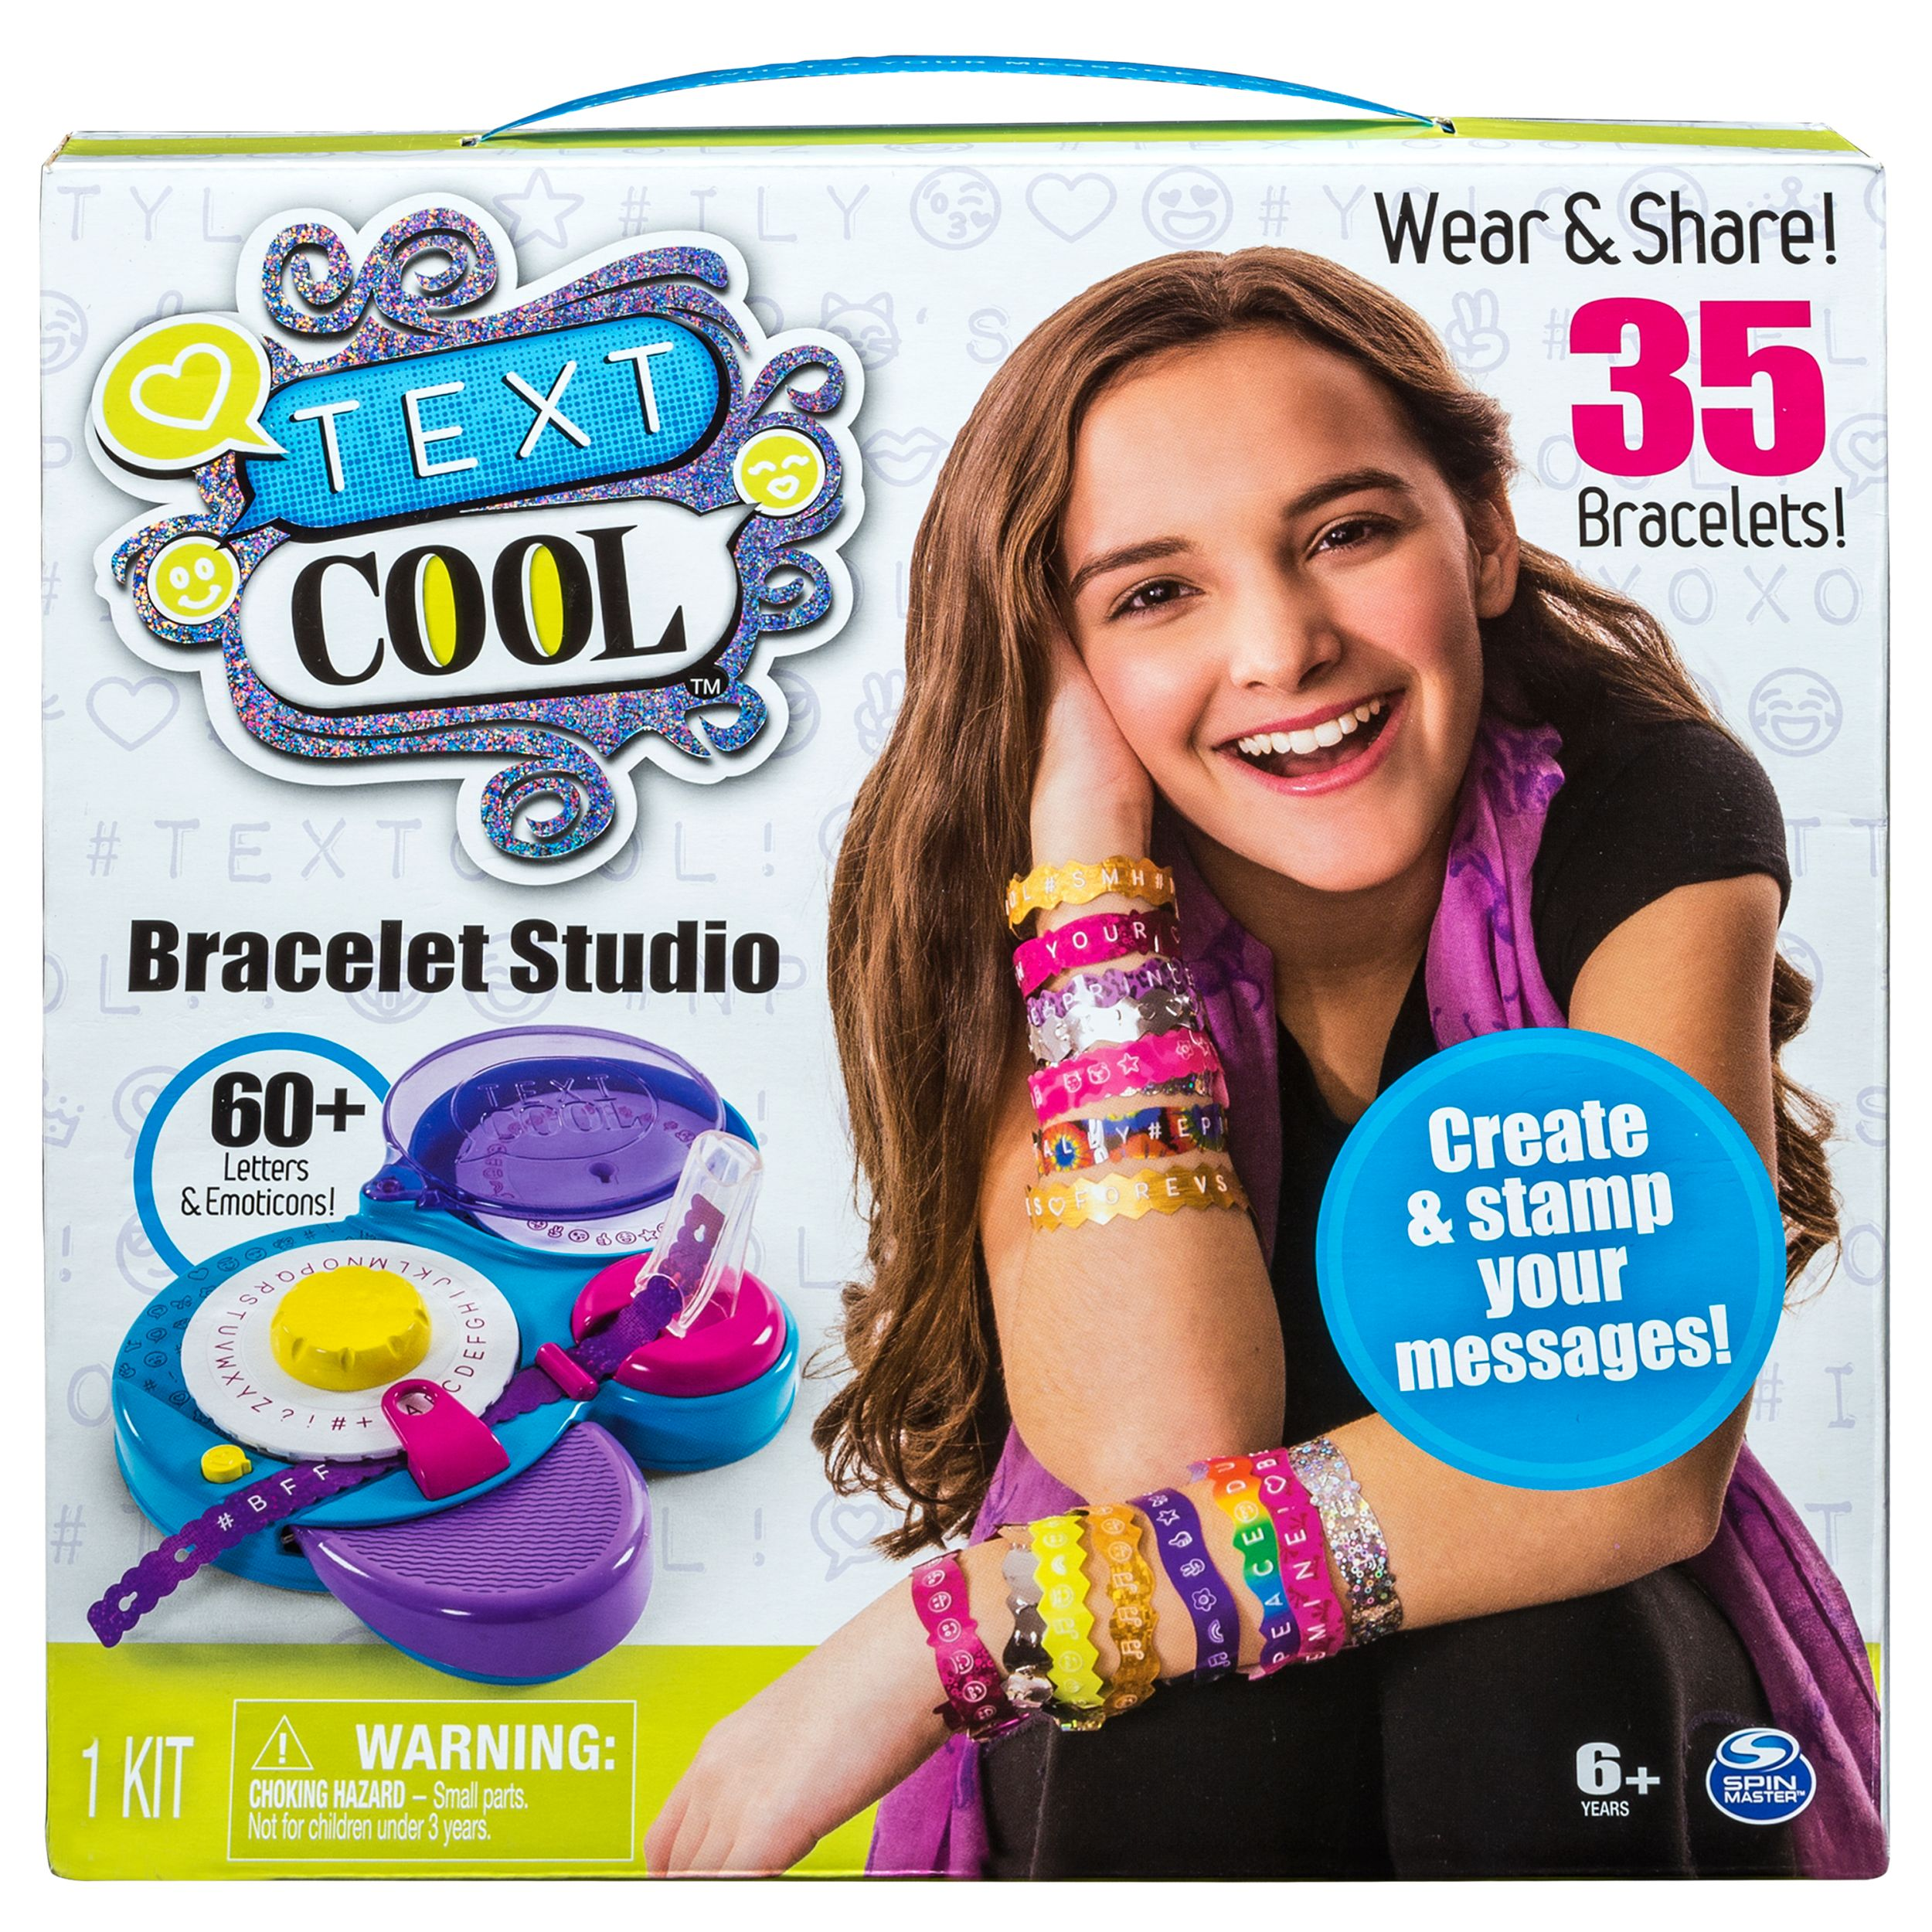 Text Cool, Bracelet Studio